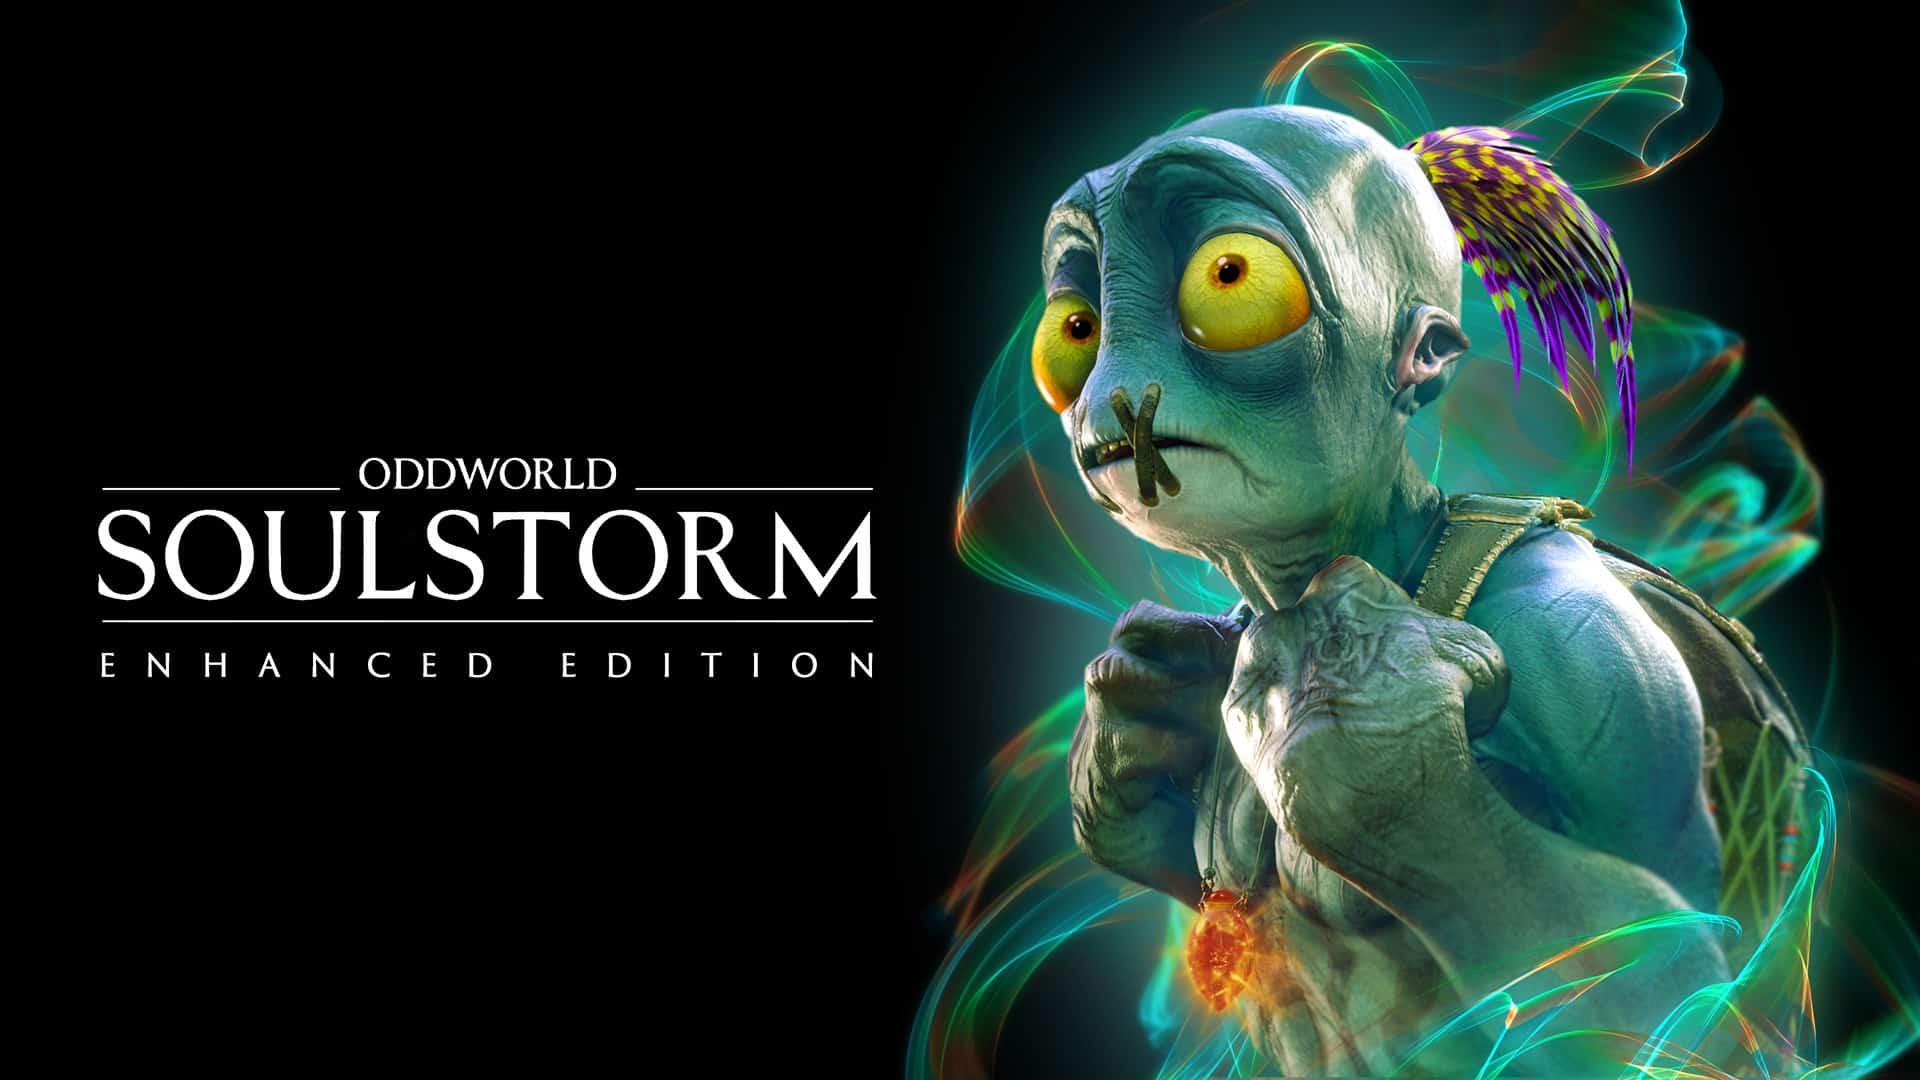 Oddworld: Soulstorm Enhanced